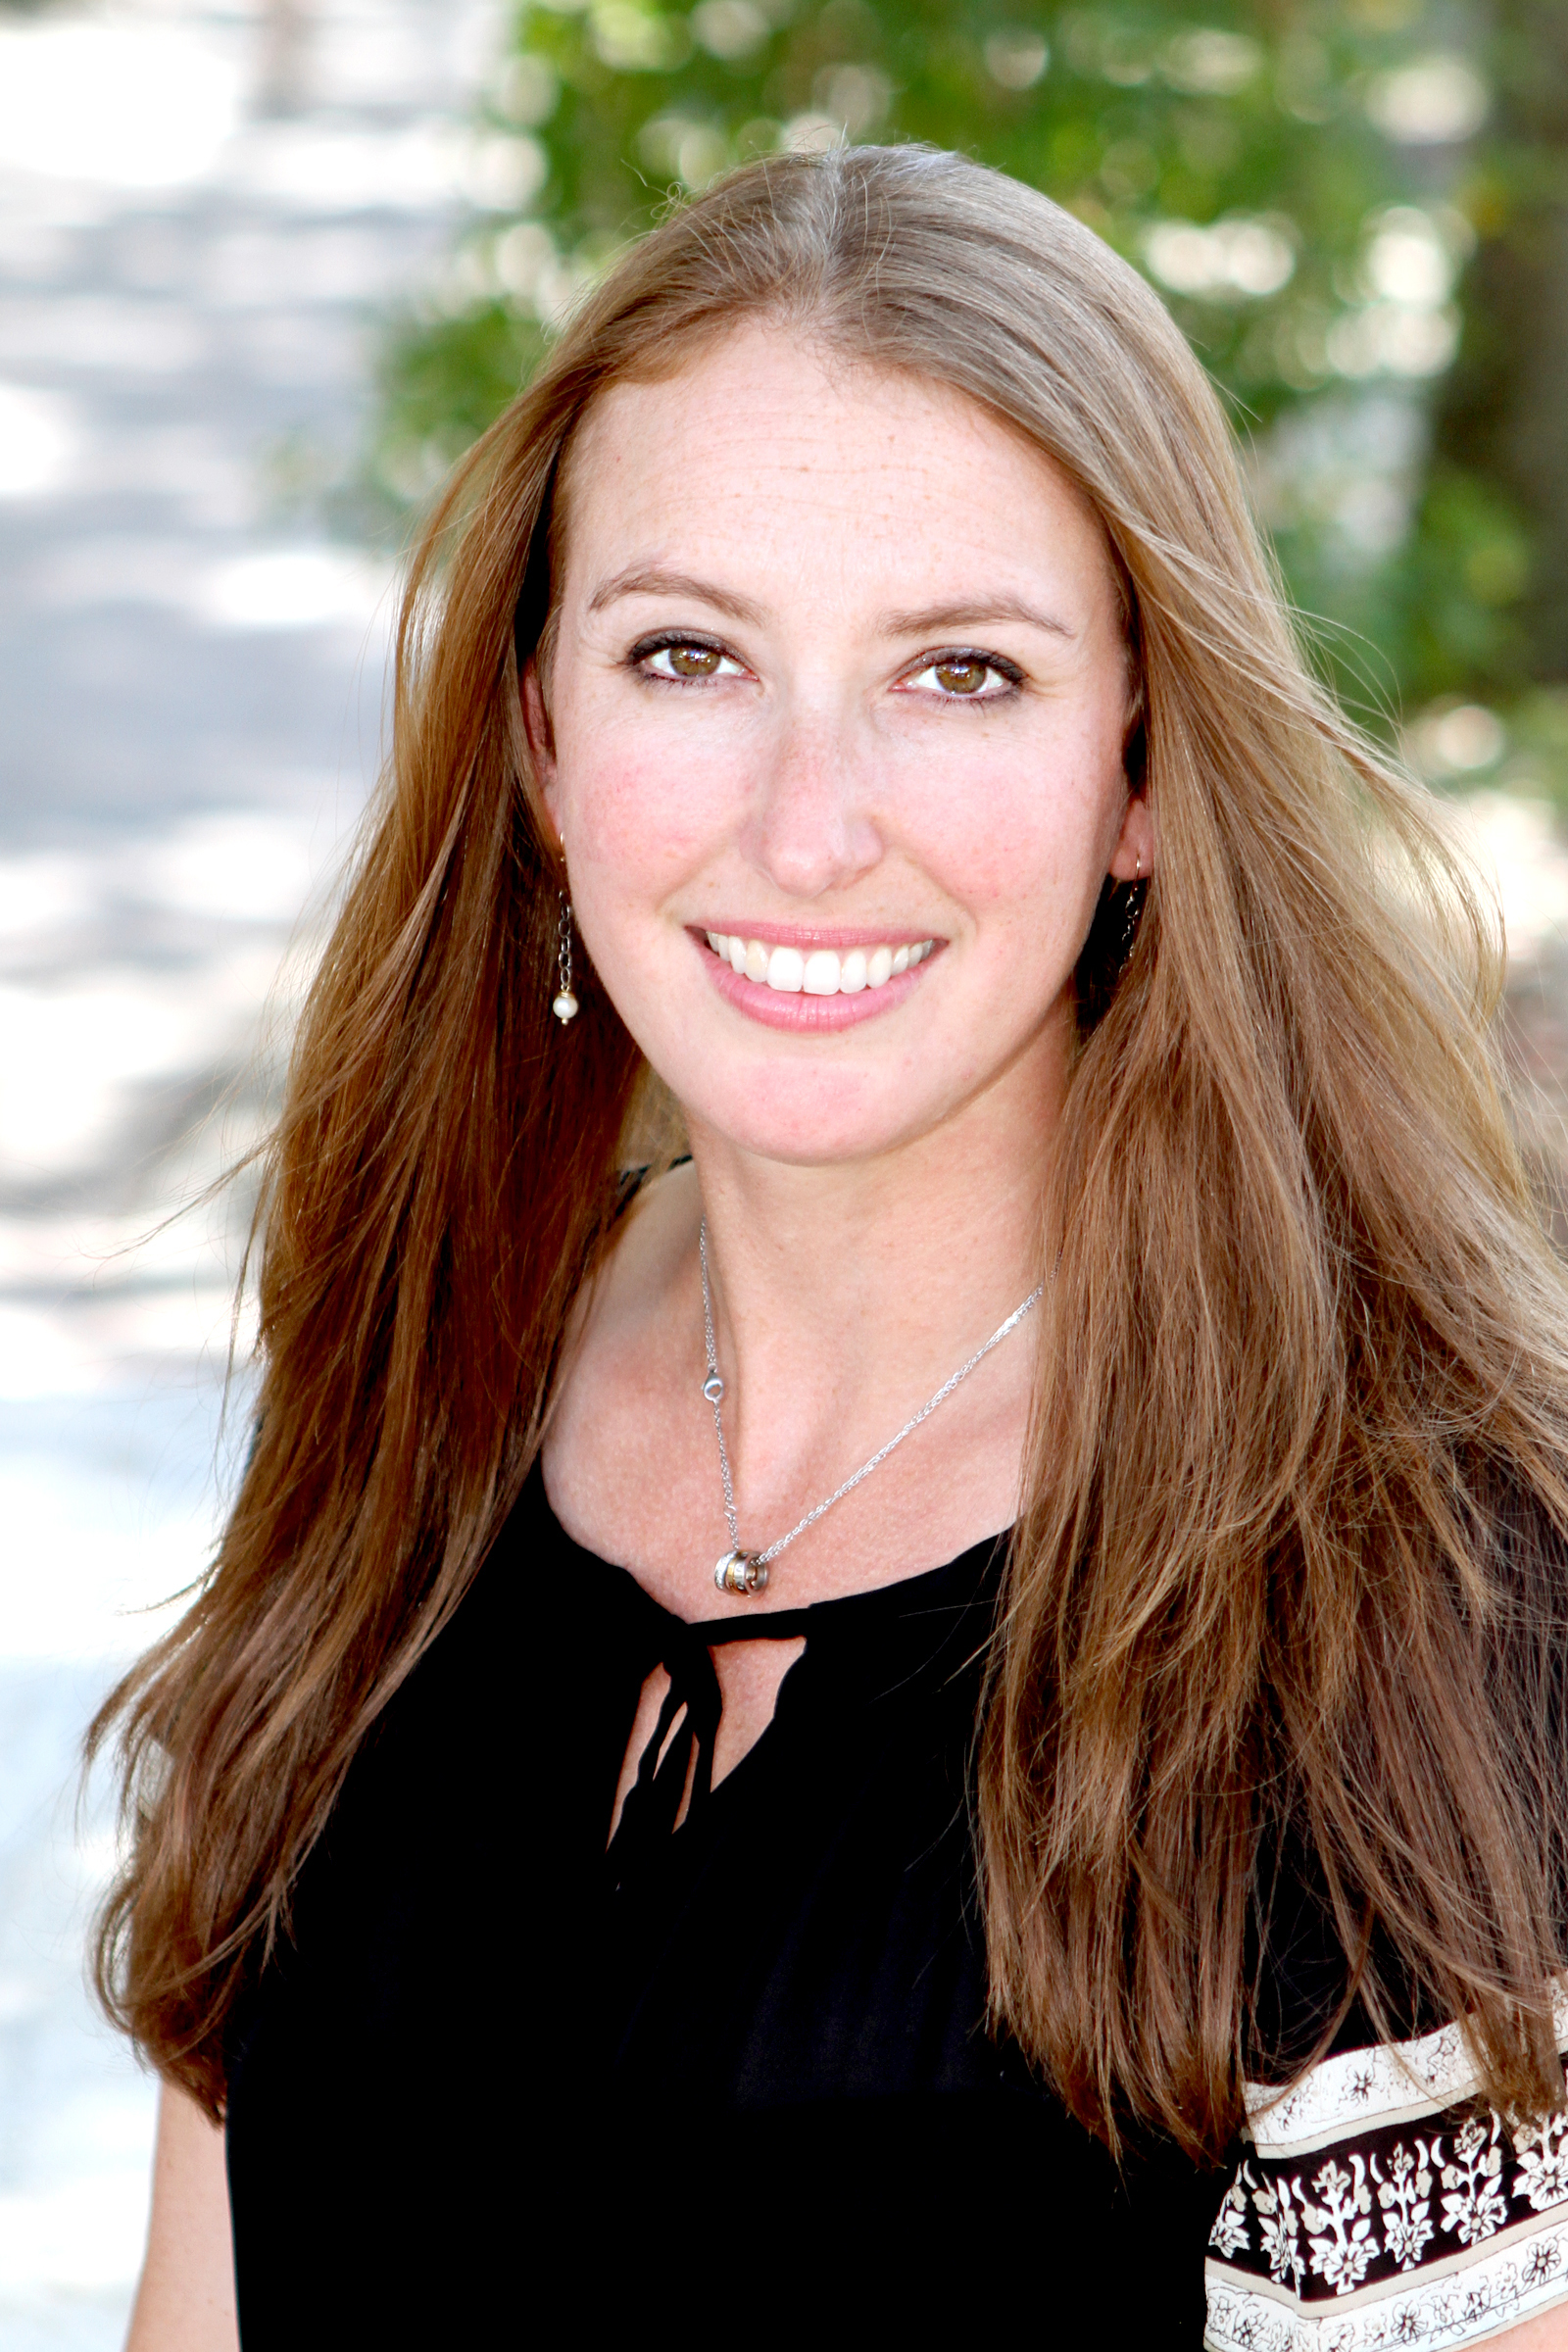 Kim Bentkover, Director of Community Relations & Outreach